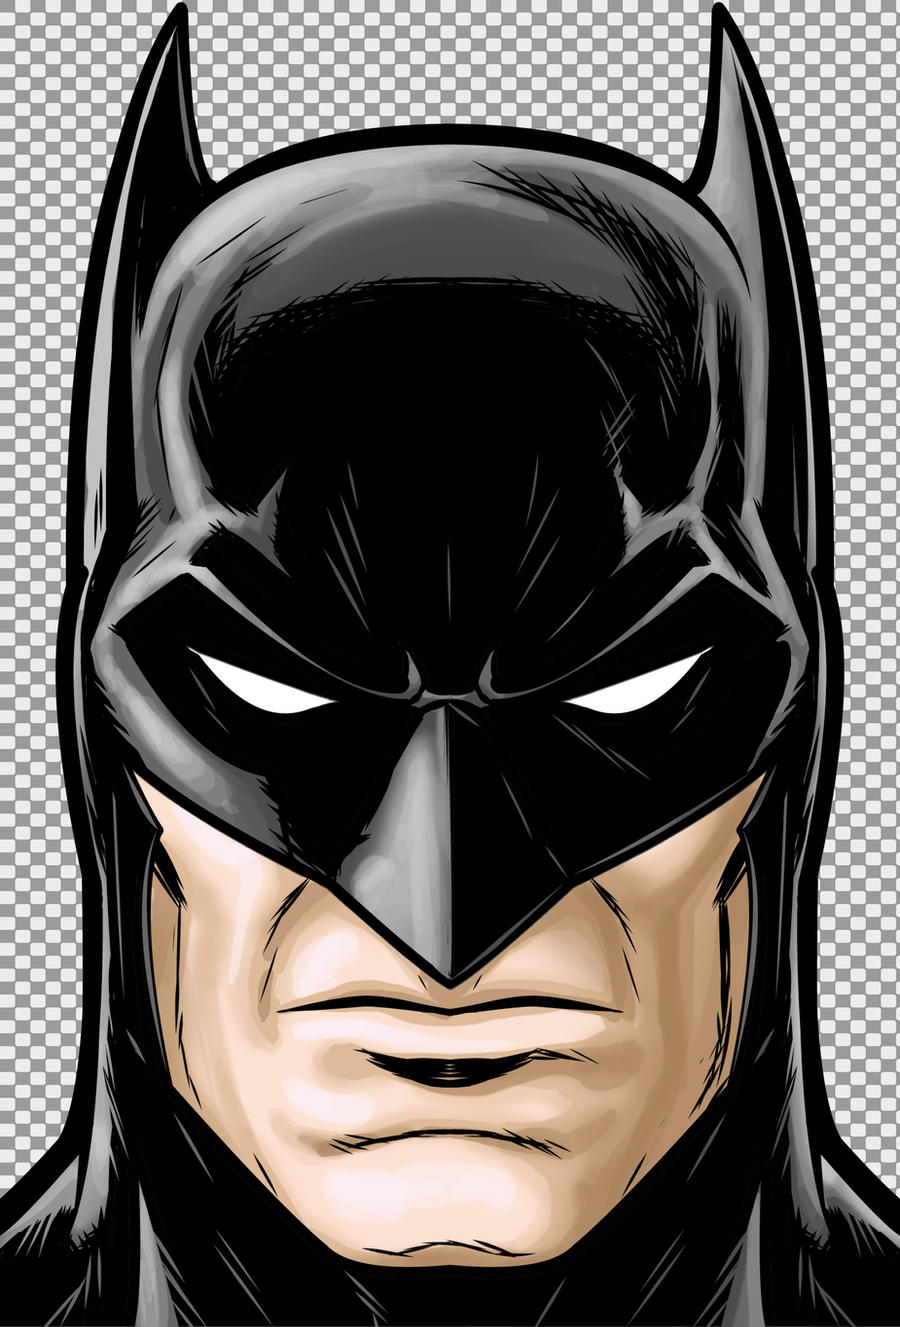 Batman Dark knight by Thuddleston